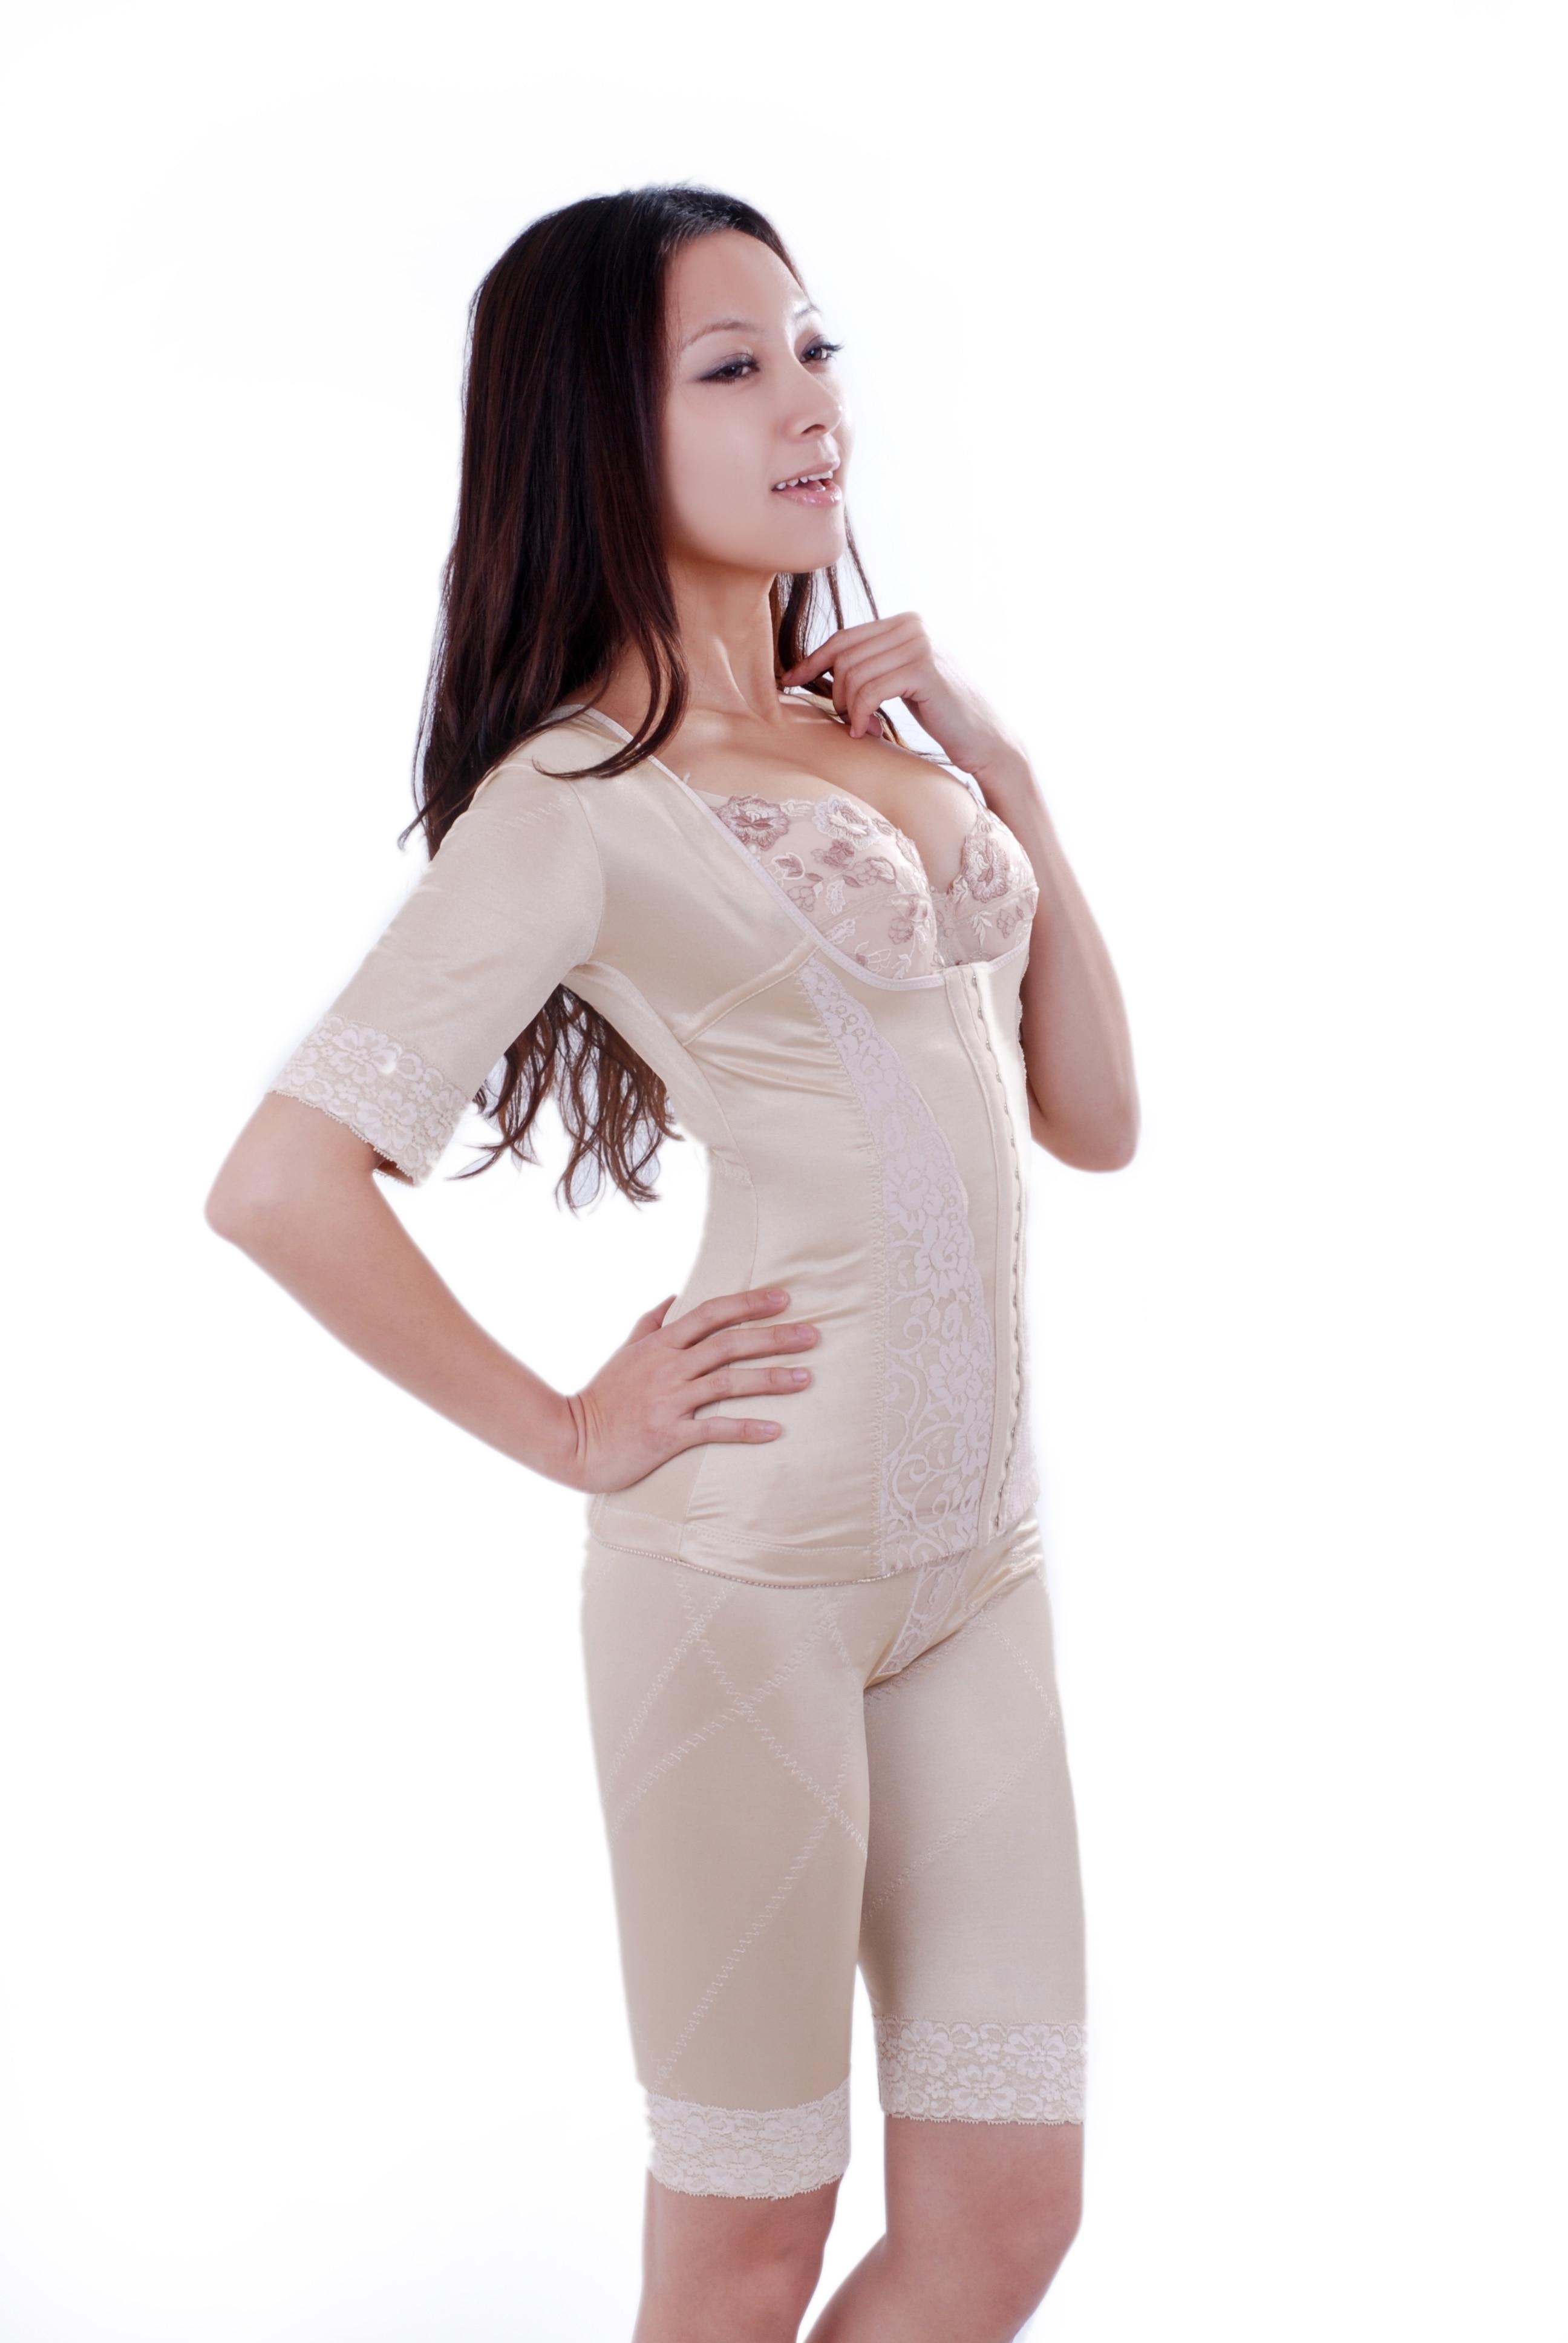 Shapewear Women Full Body Women Slimming Waist Body Shaper Tummy Trimmer Bodysuit corset Weight Loss Butt Lifter Underwear Юбка